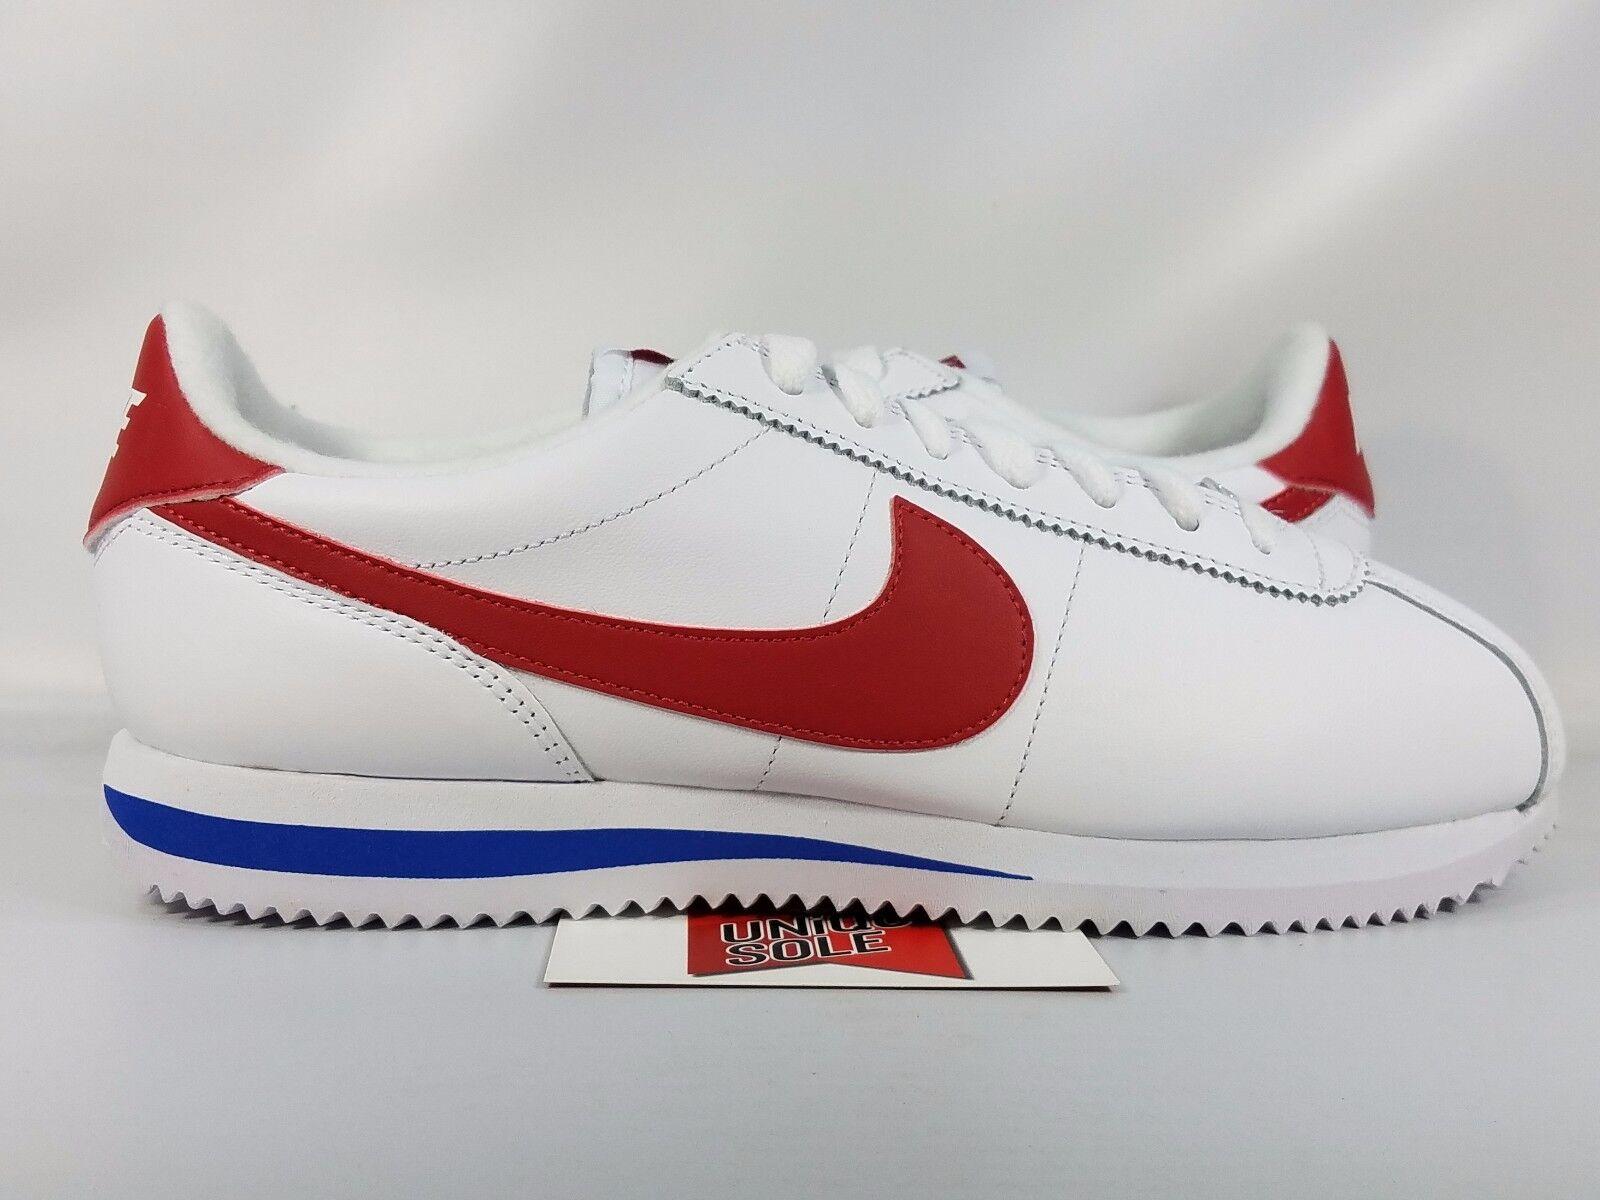 Nike Cortez Leather FORREST GUMP Rouge Blanc Bleu 882254-164  STRANGER THINGS